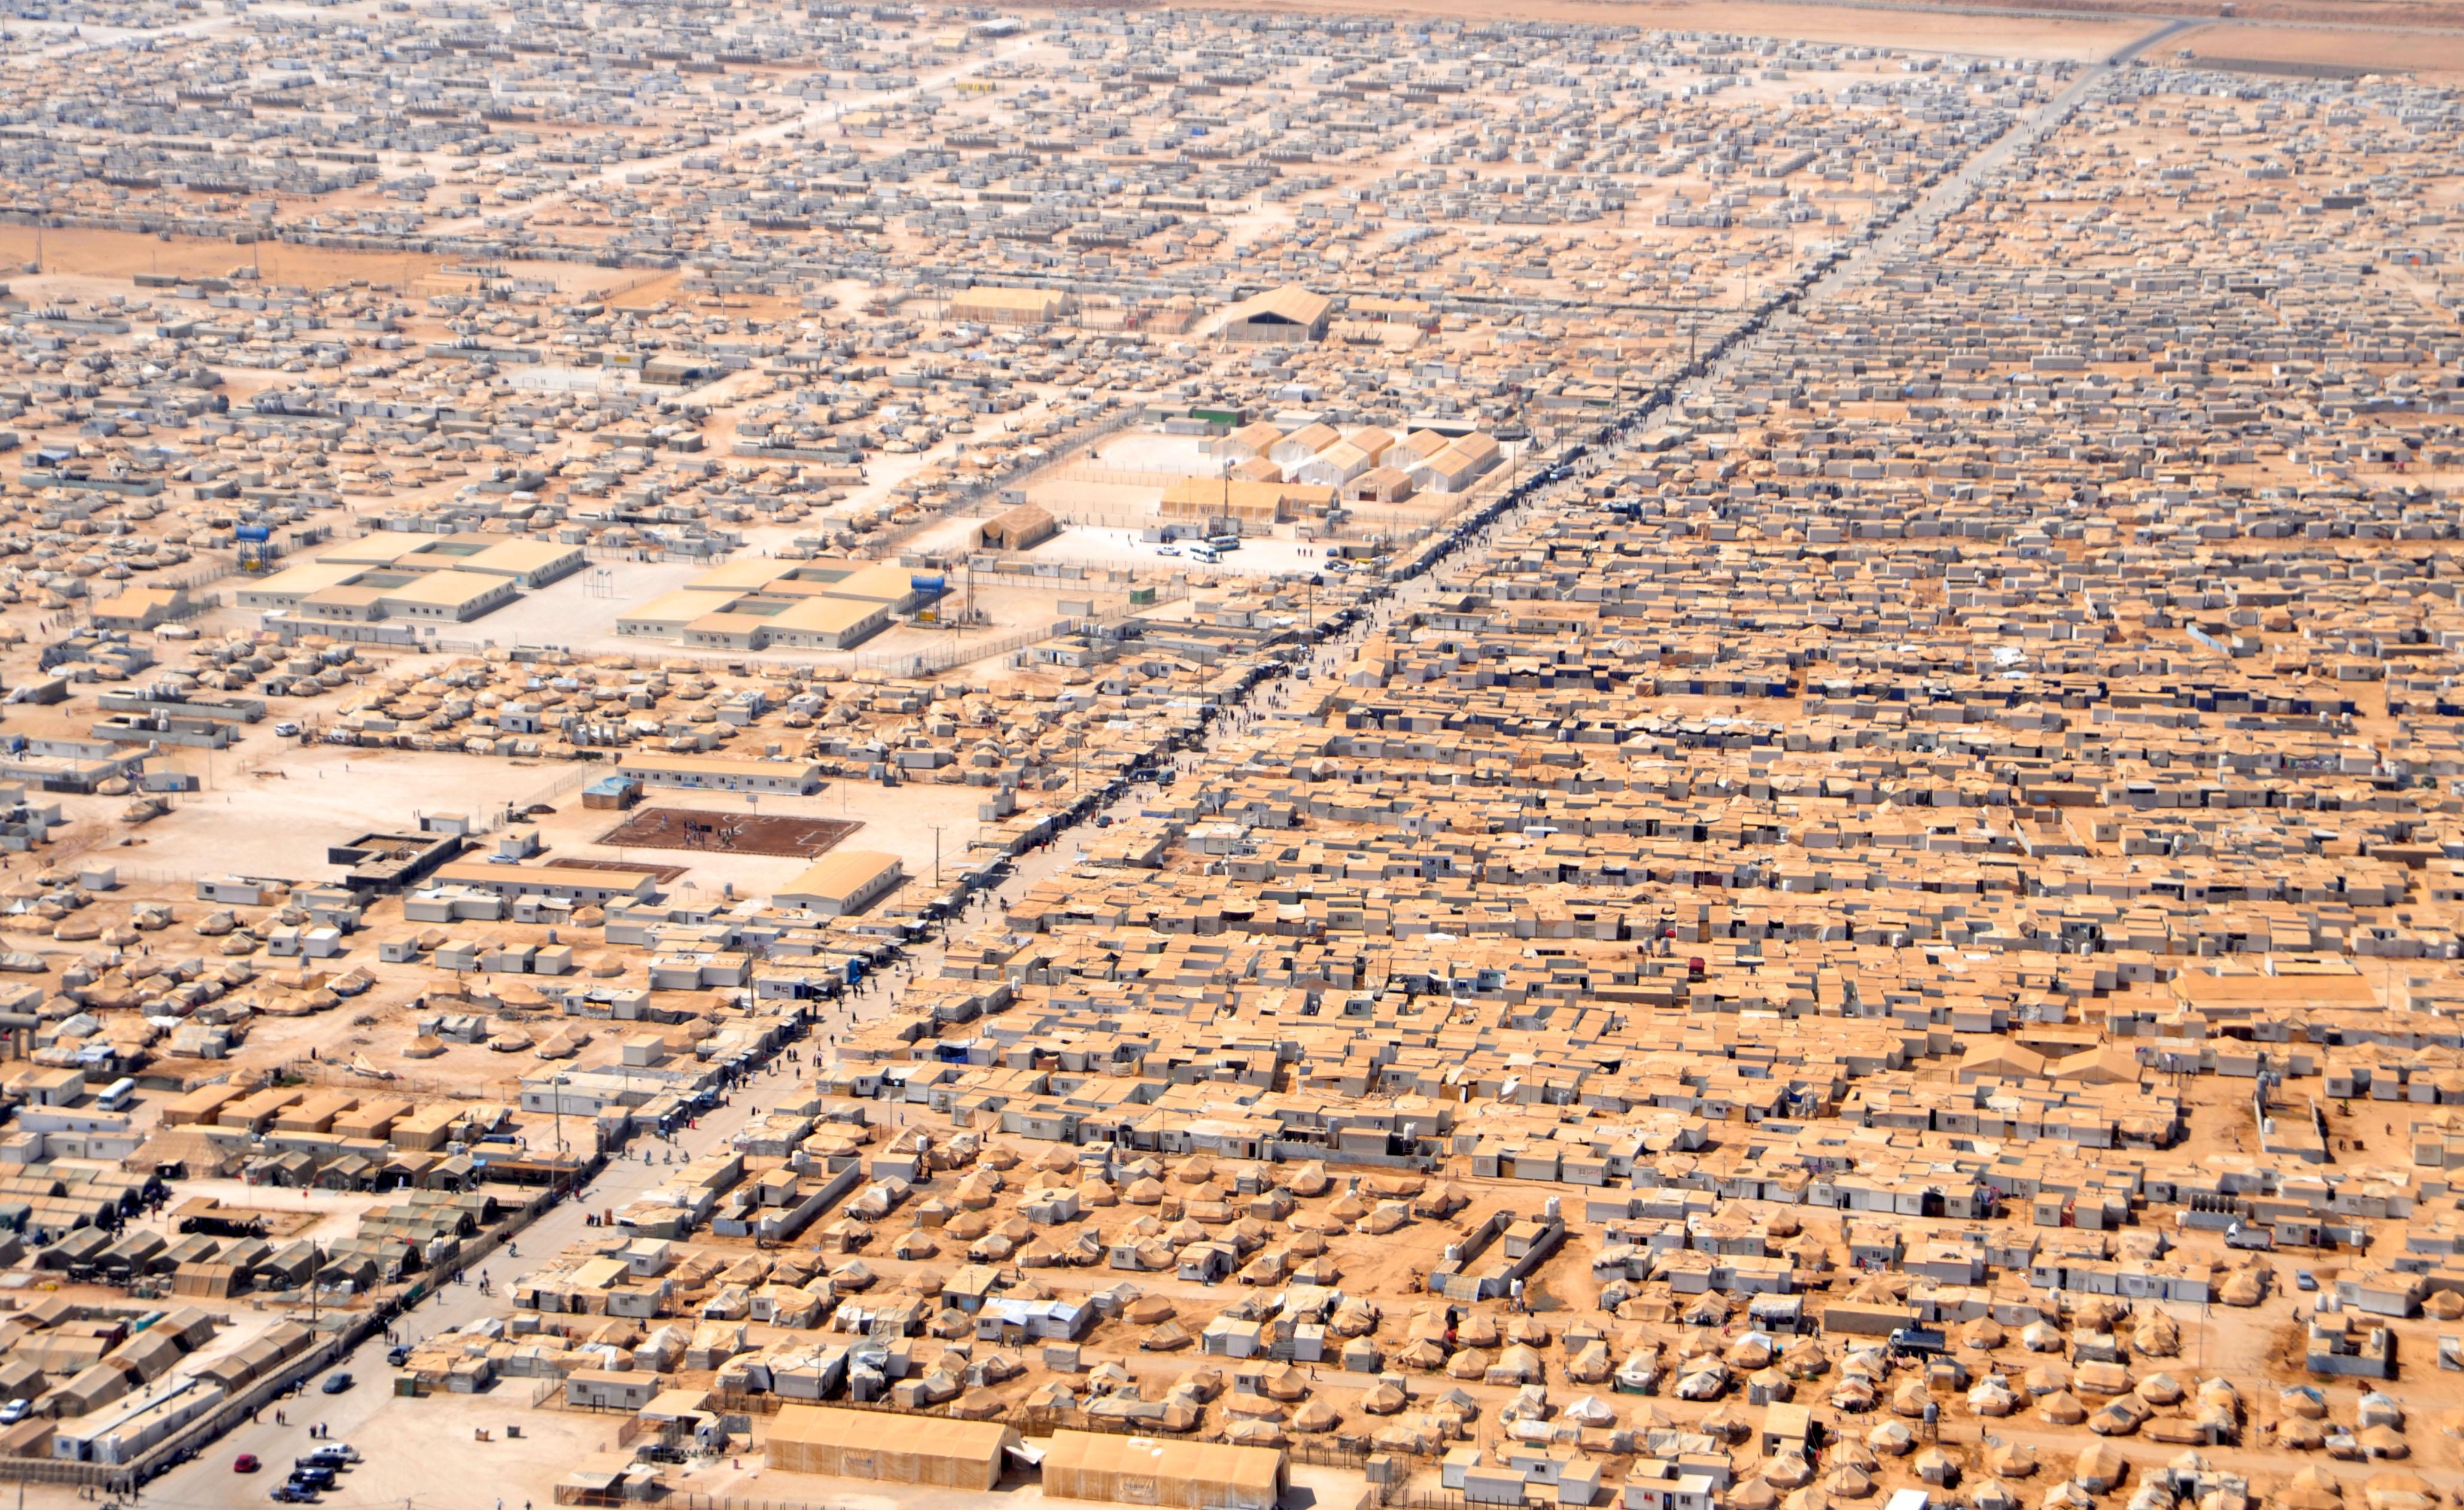 An_Aerial_View_of_the_Za'atri_Refugee_Ca